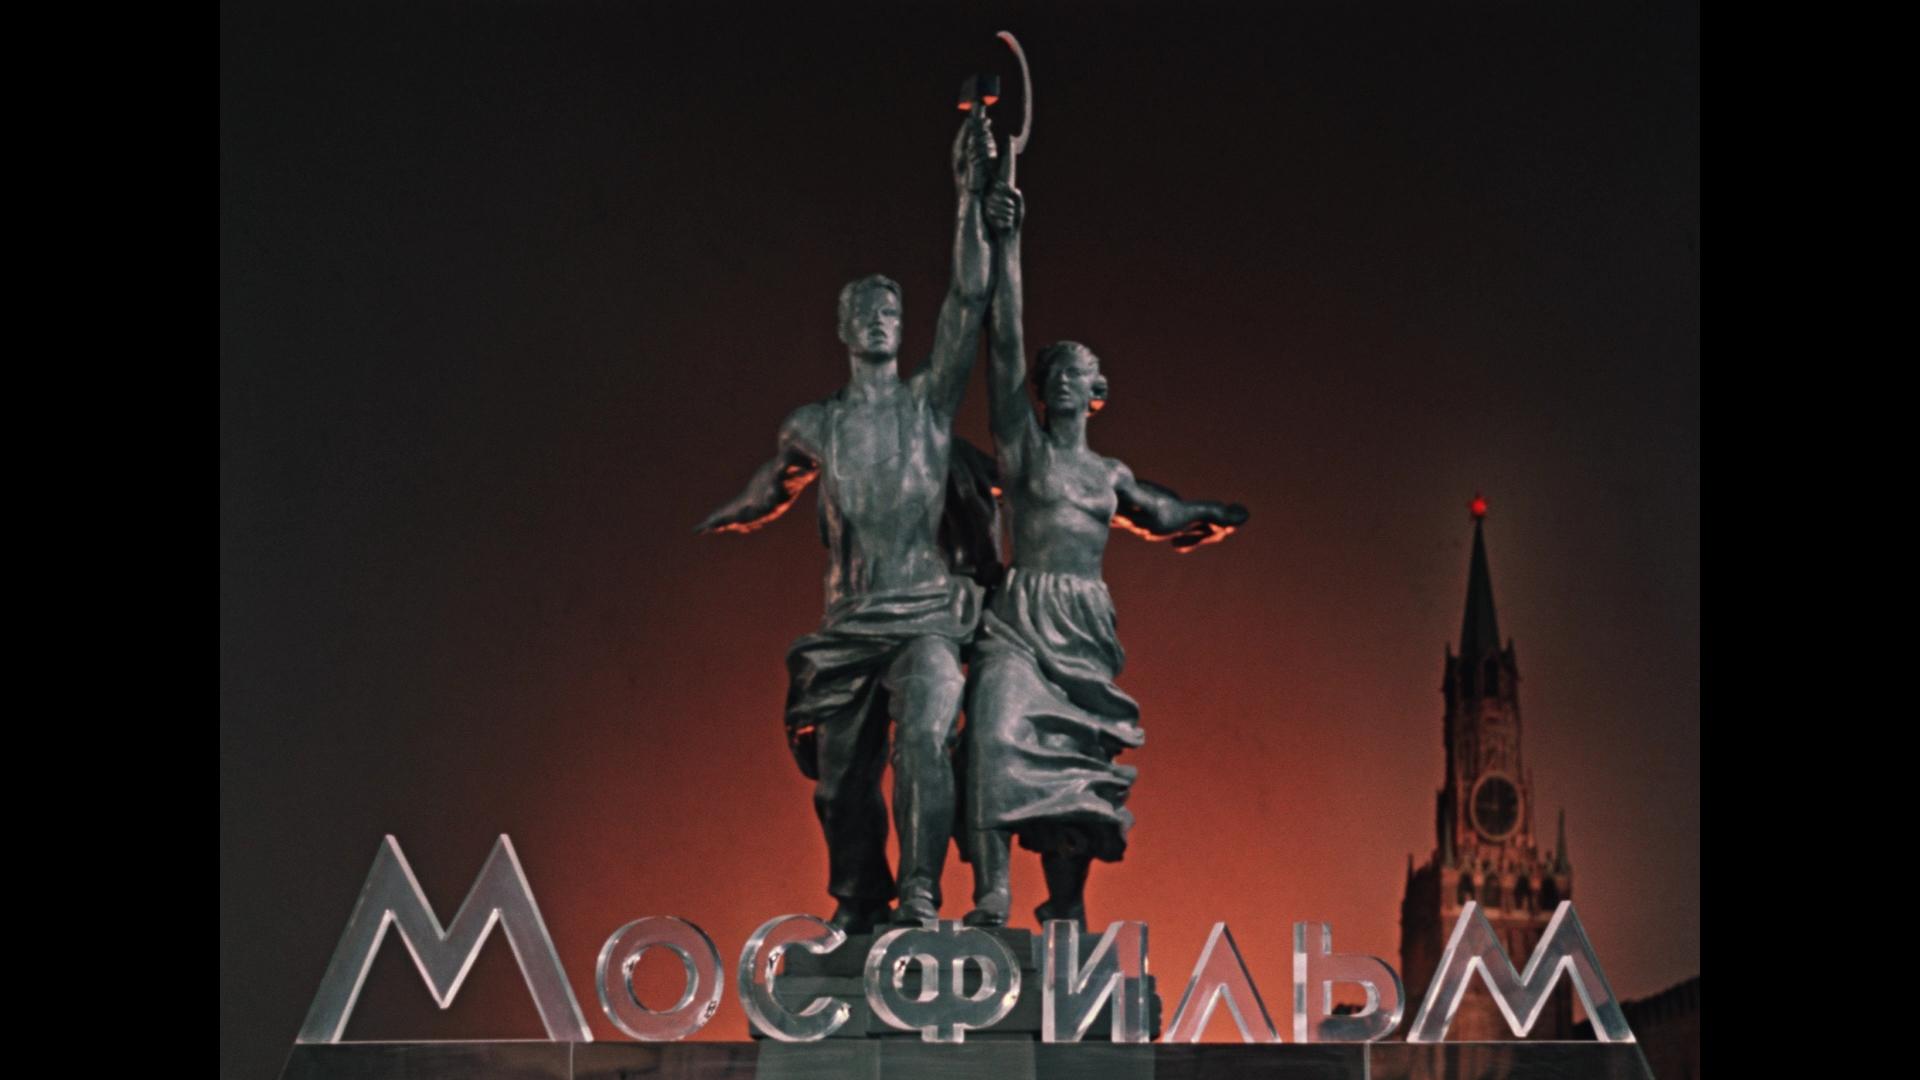 мосфильм заставка картинка